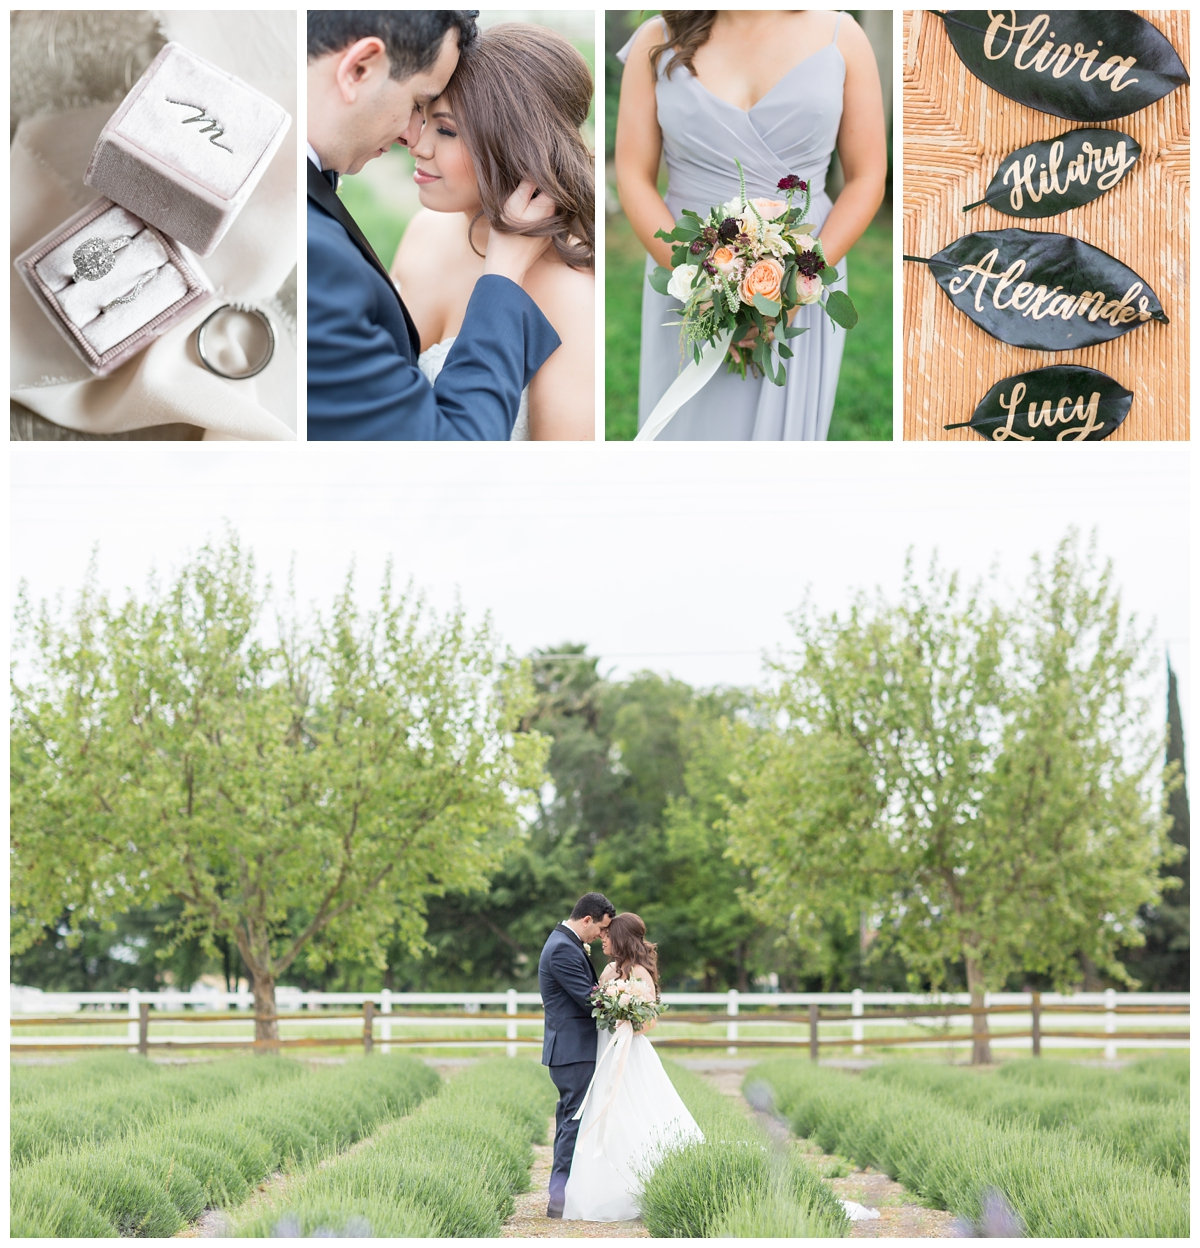 Pageo-Lavender-Farms-Wedding-Photos_4789-1.jpg